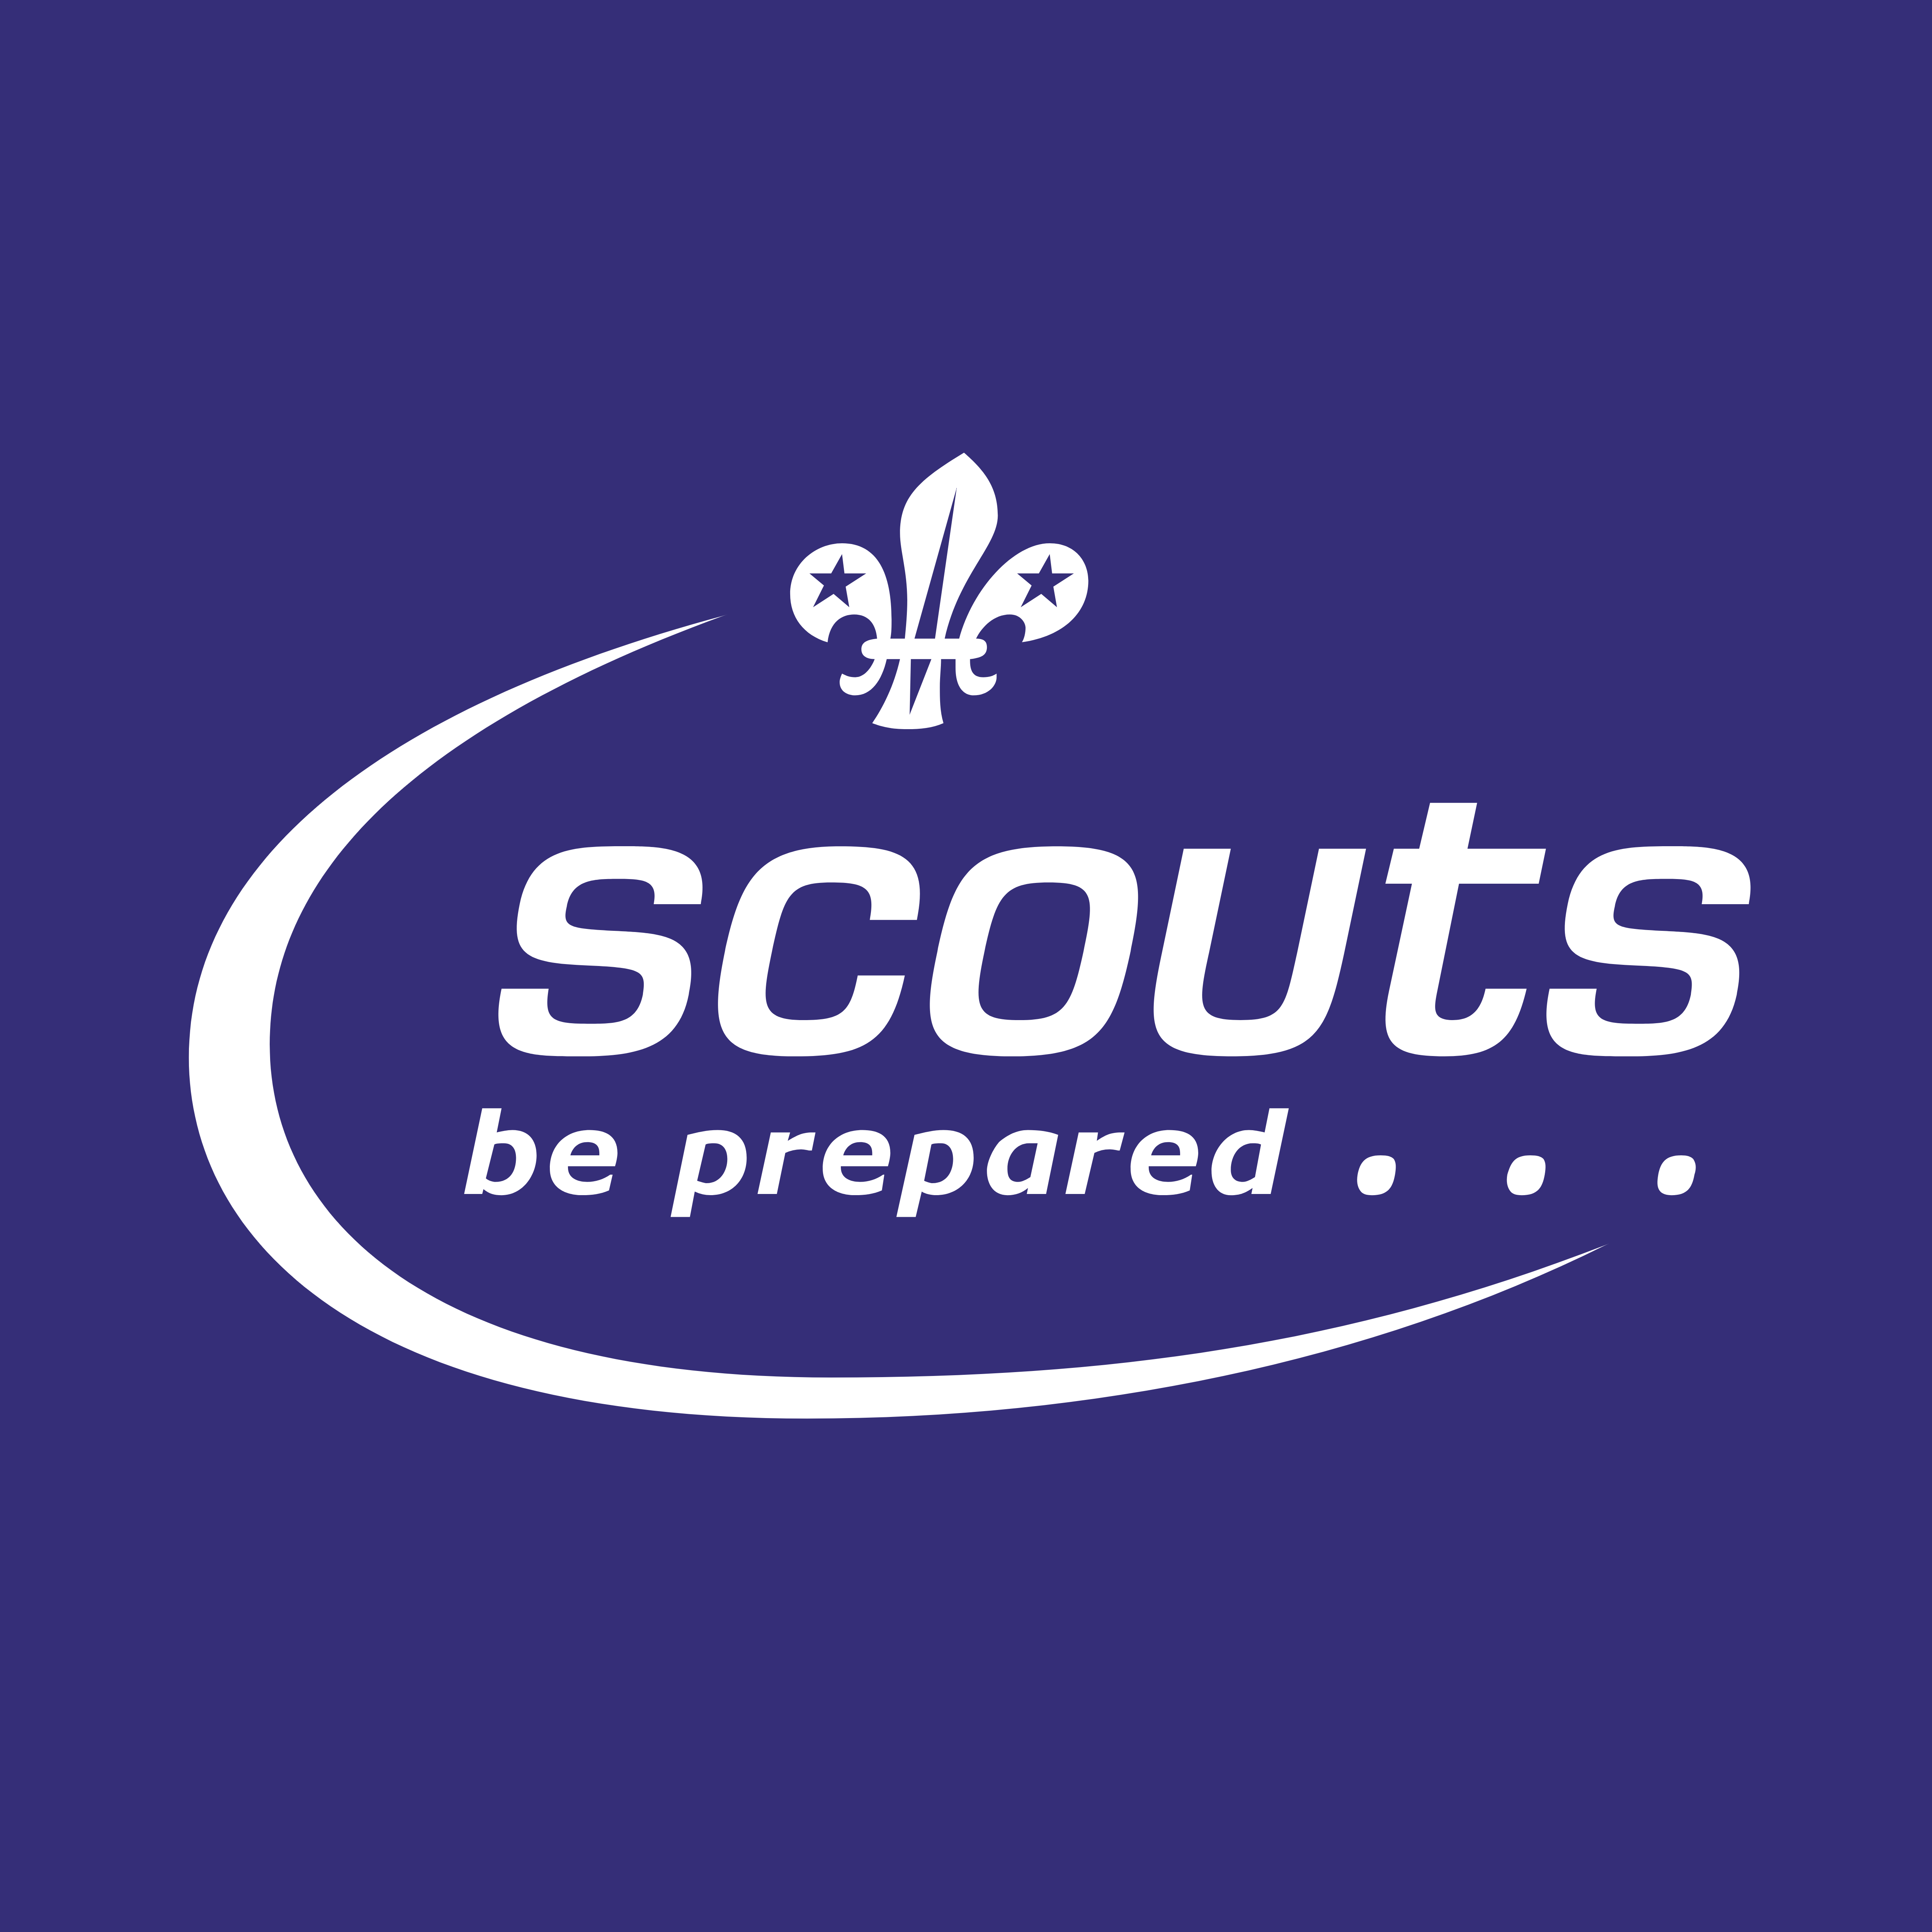 Scouts - Logos Download